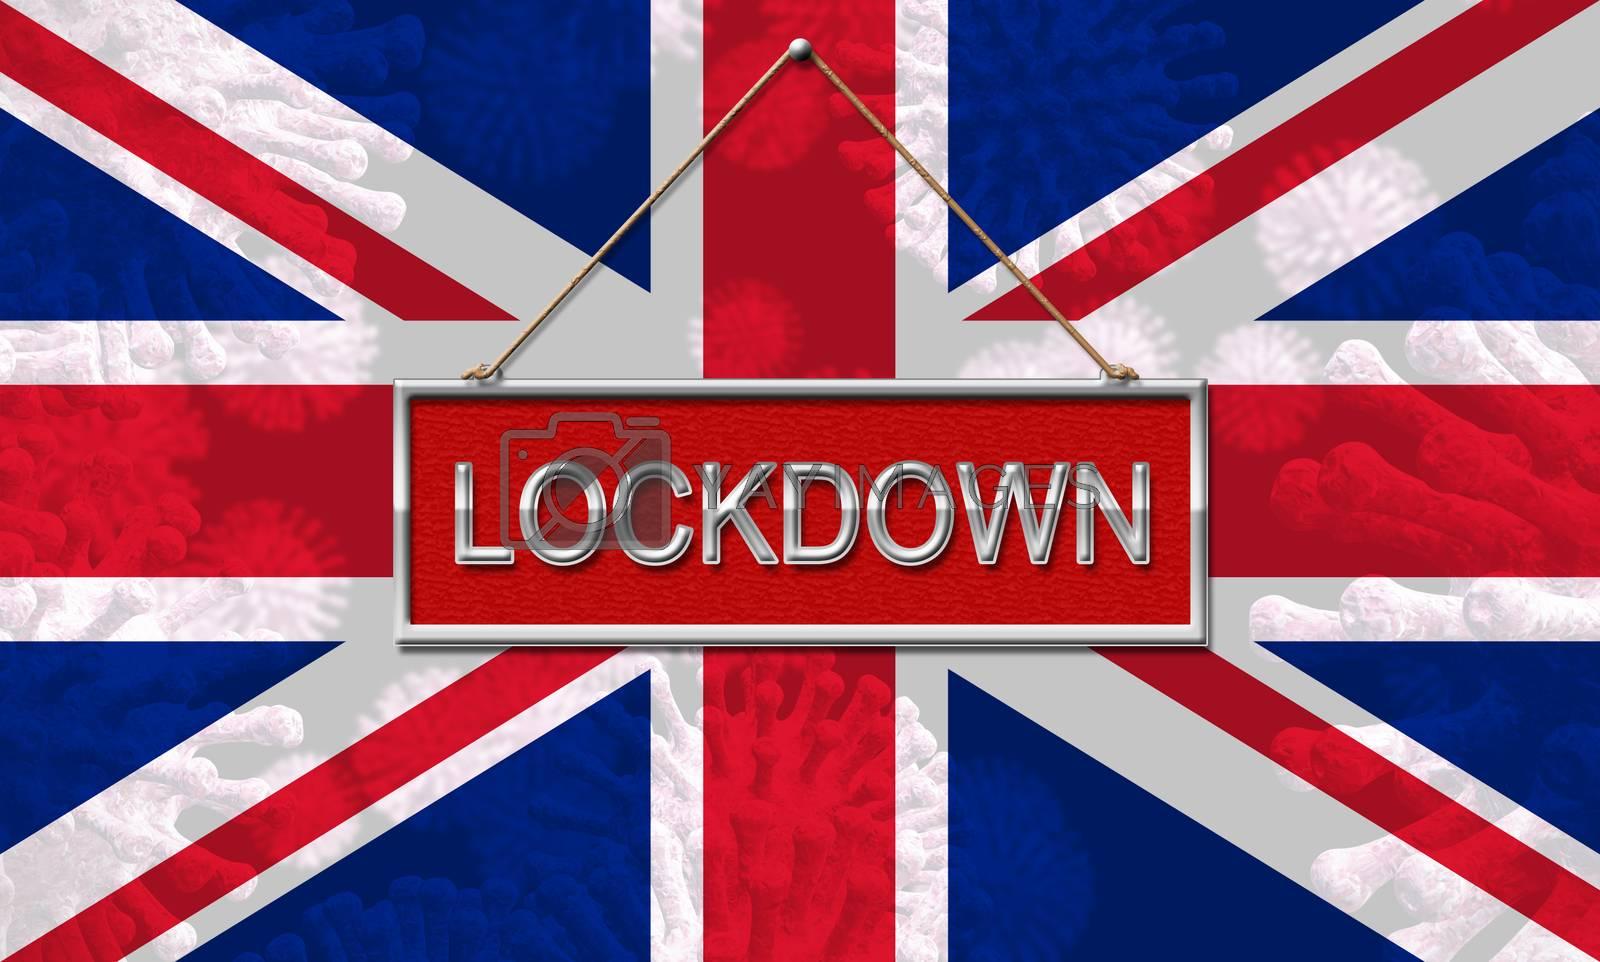 UK lockdown emergency preventing coronavirus spread or outbreak. Covid 19 United Kingdom precaution to lock down virus infection - 3d Illustration